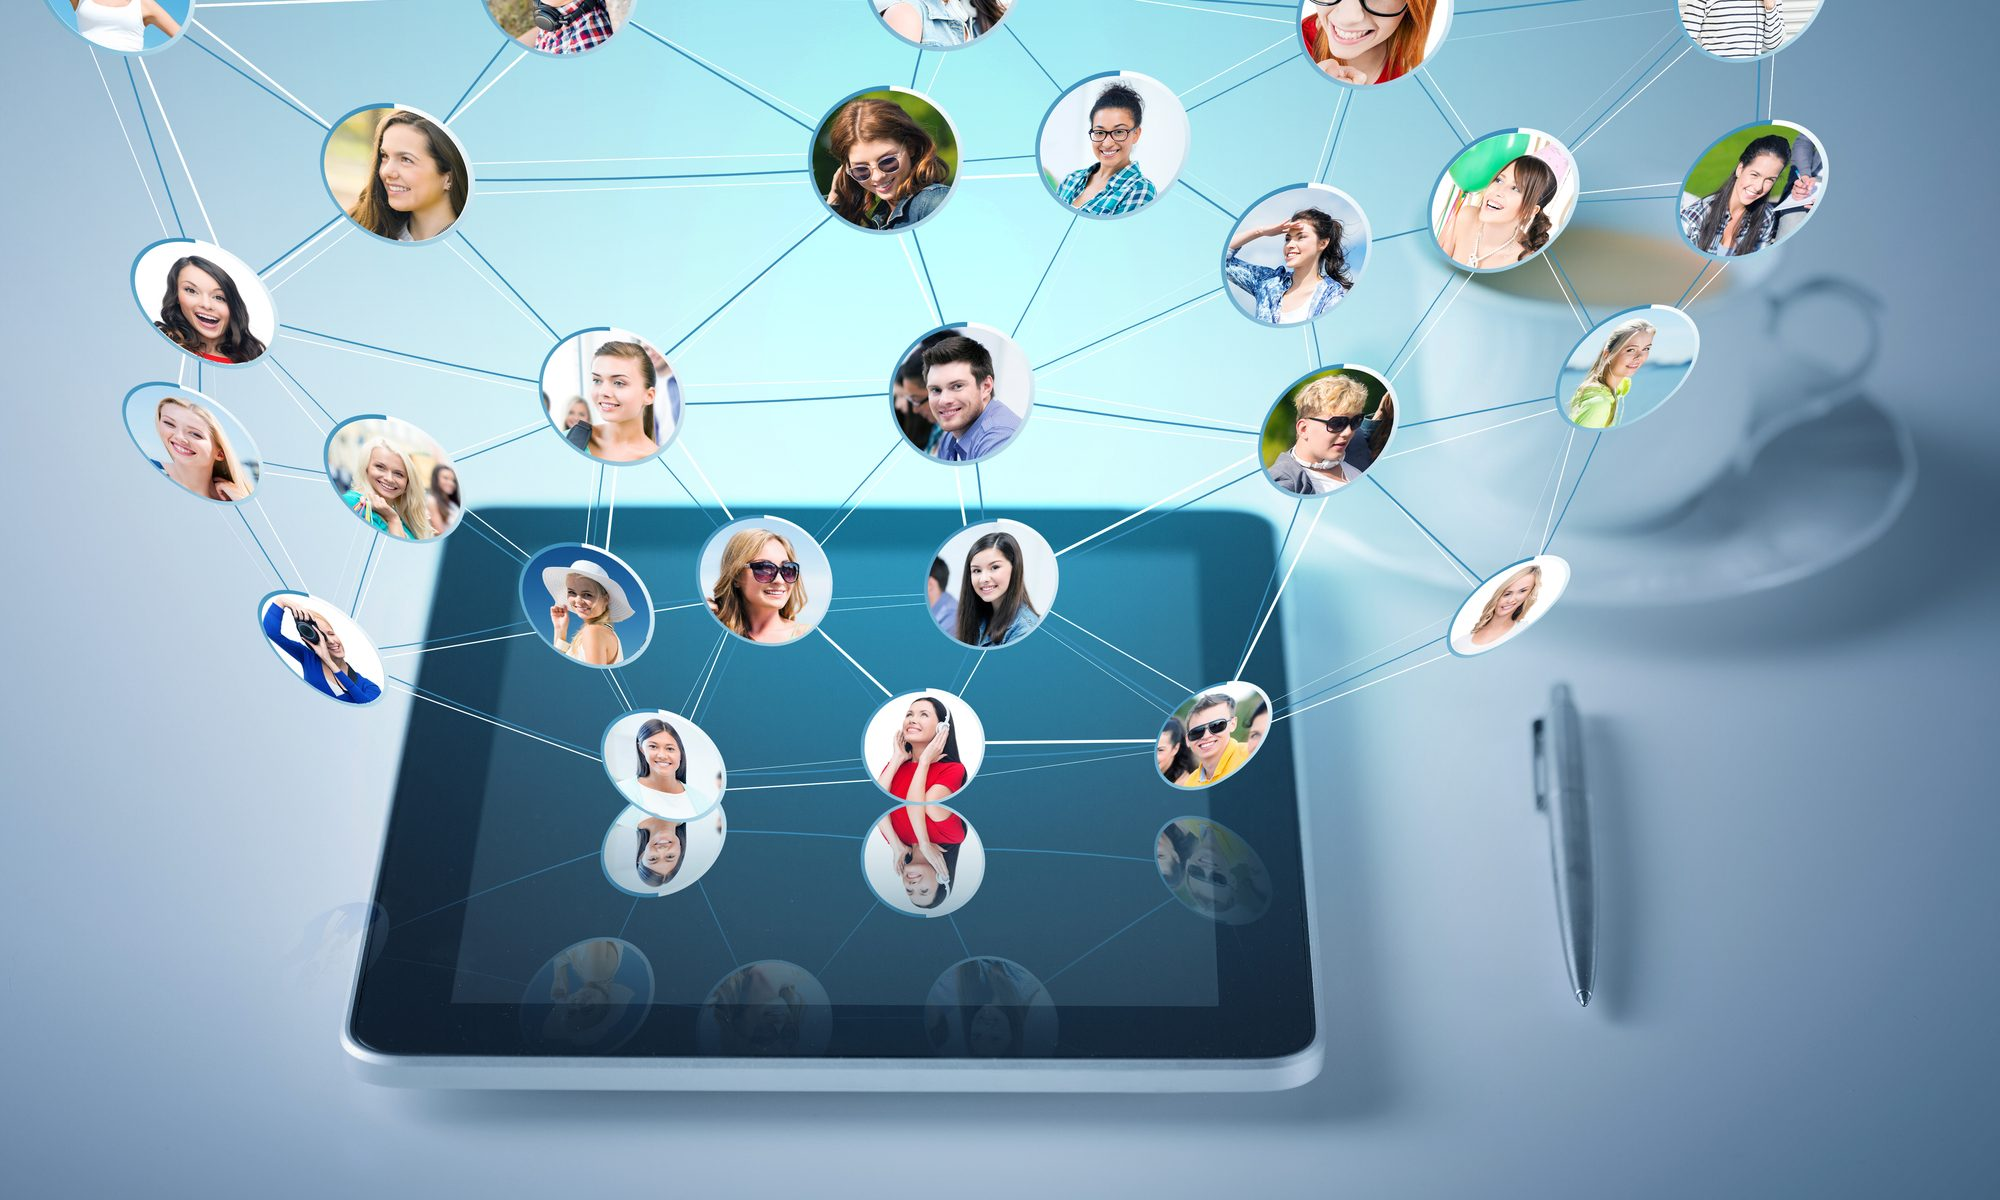 Virtuelle Kontakte auf dem Tablet